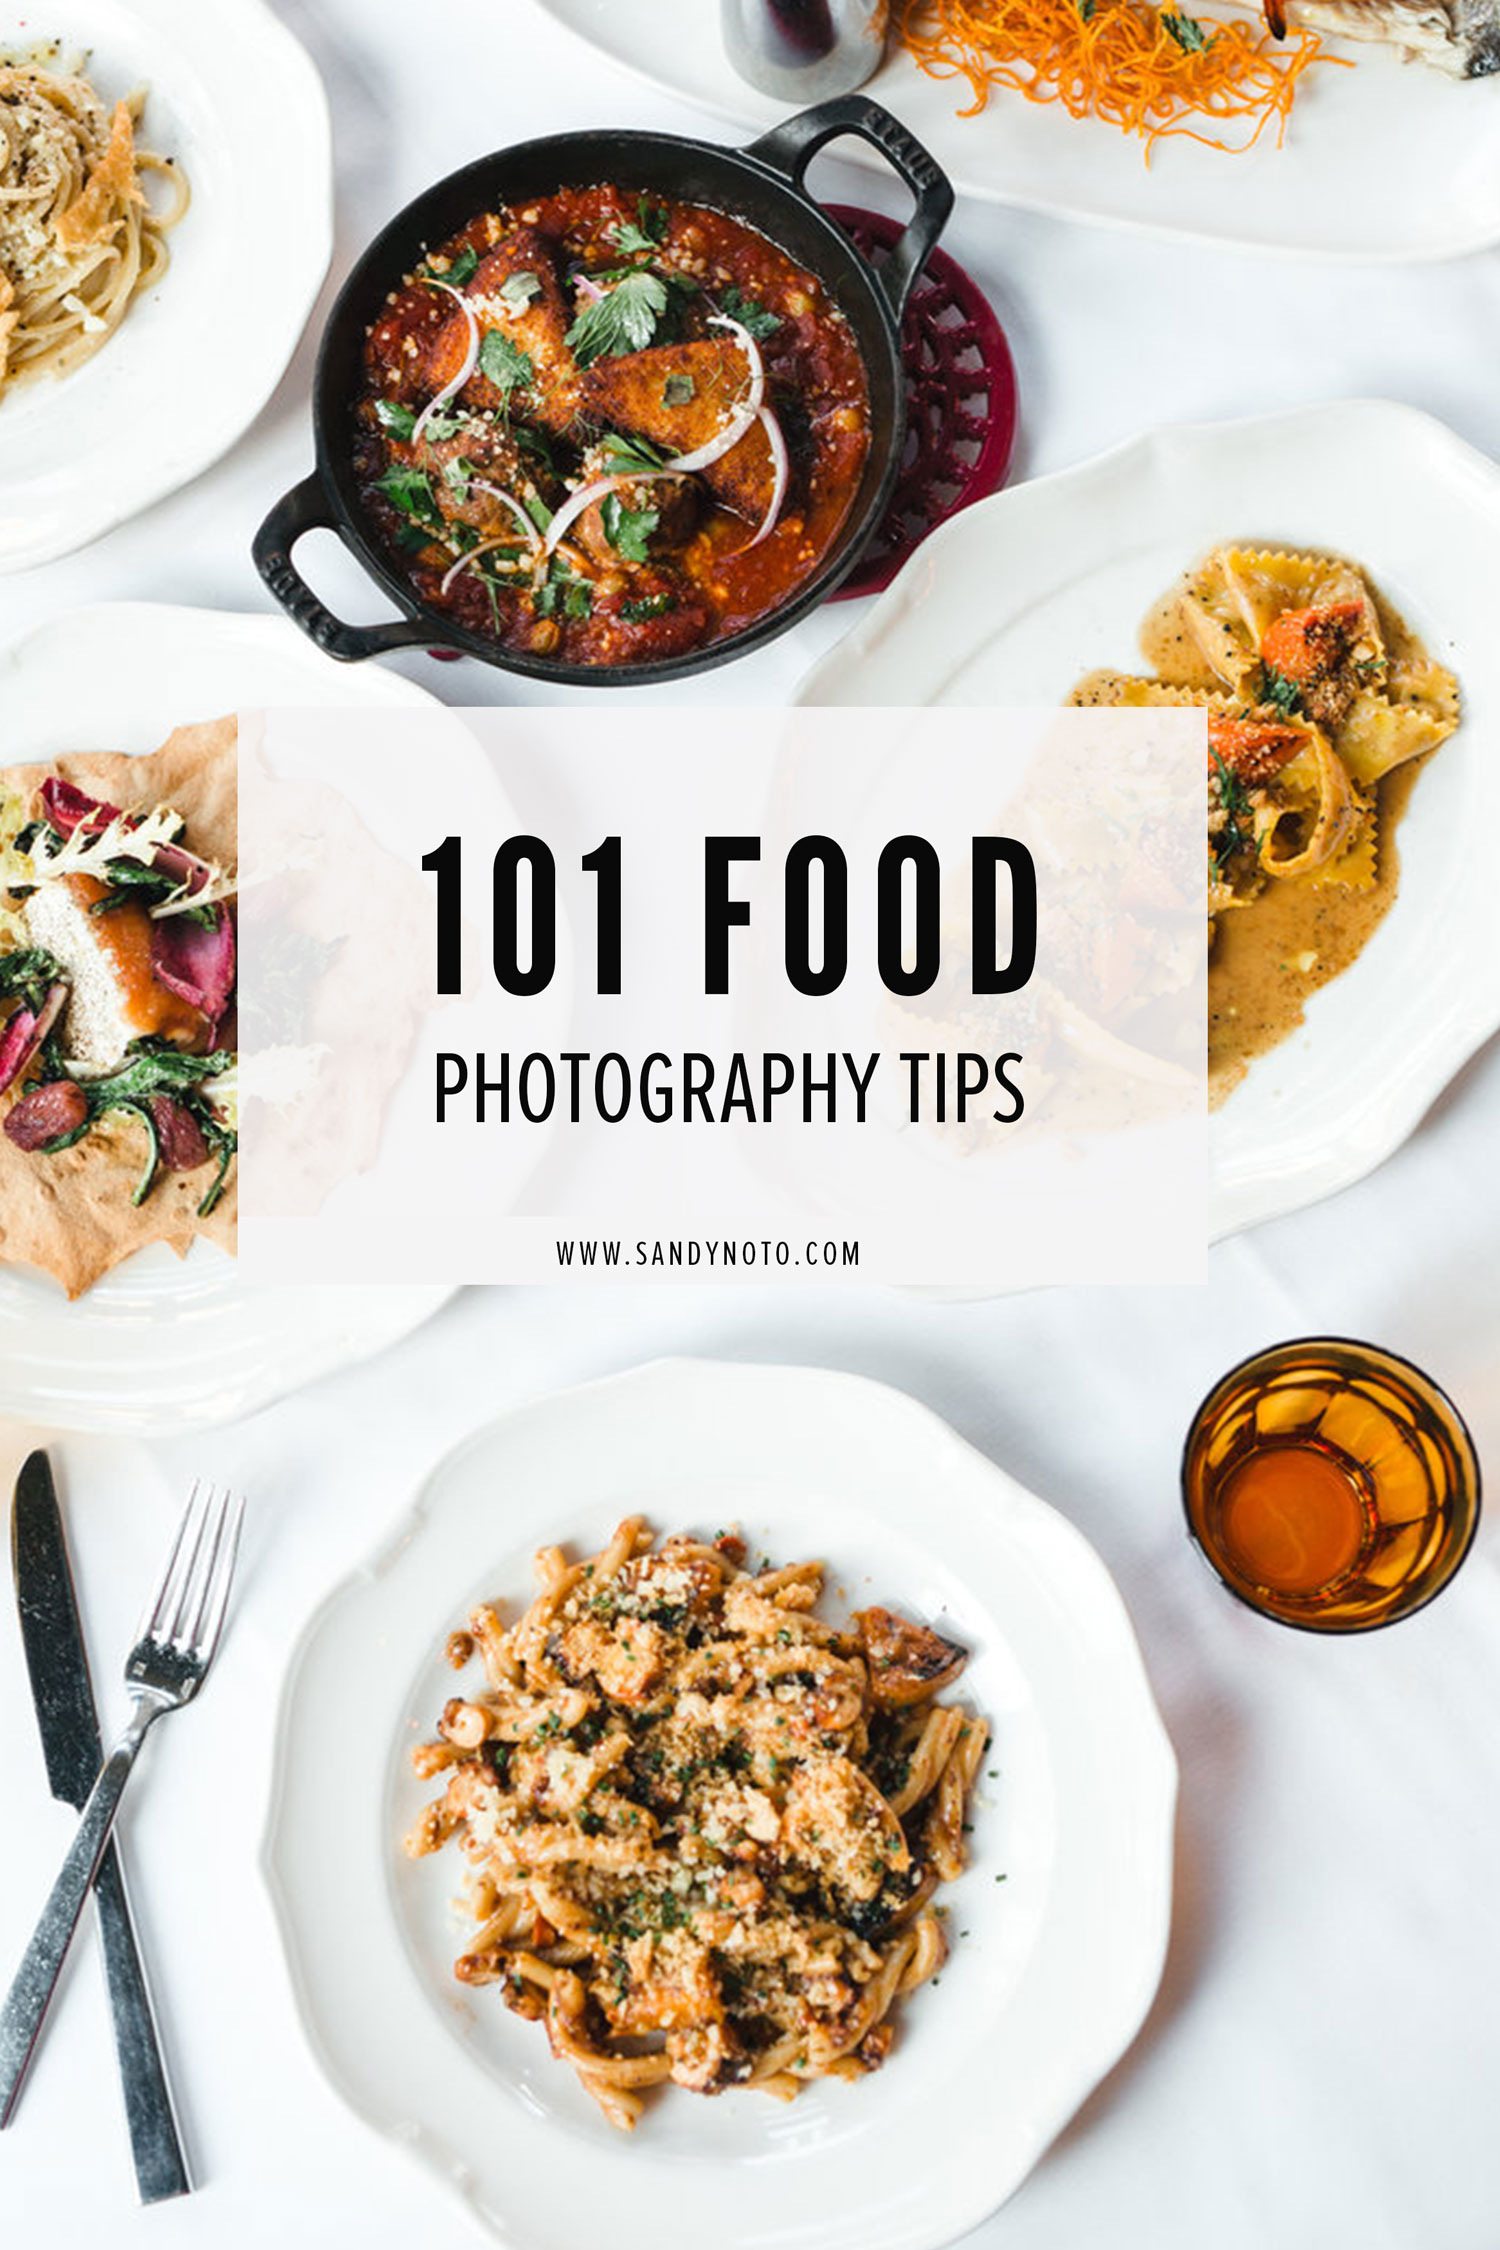 101 Food Photography Tips & Tricks